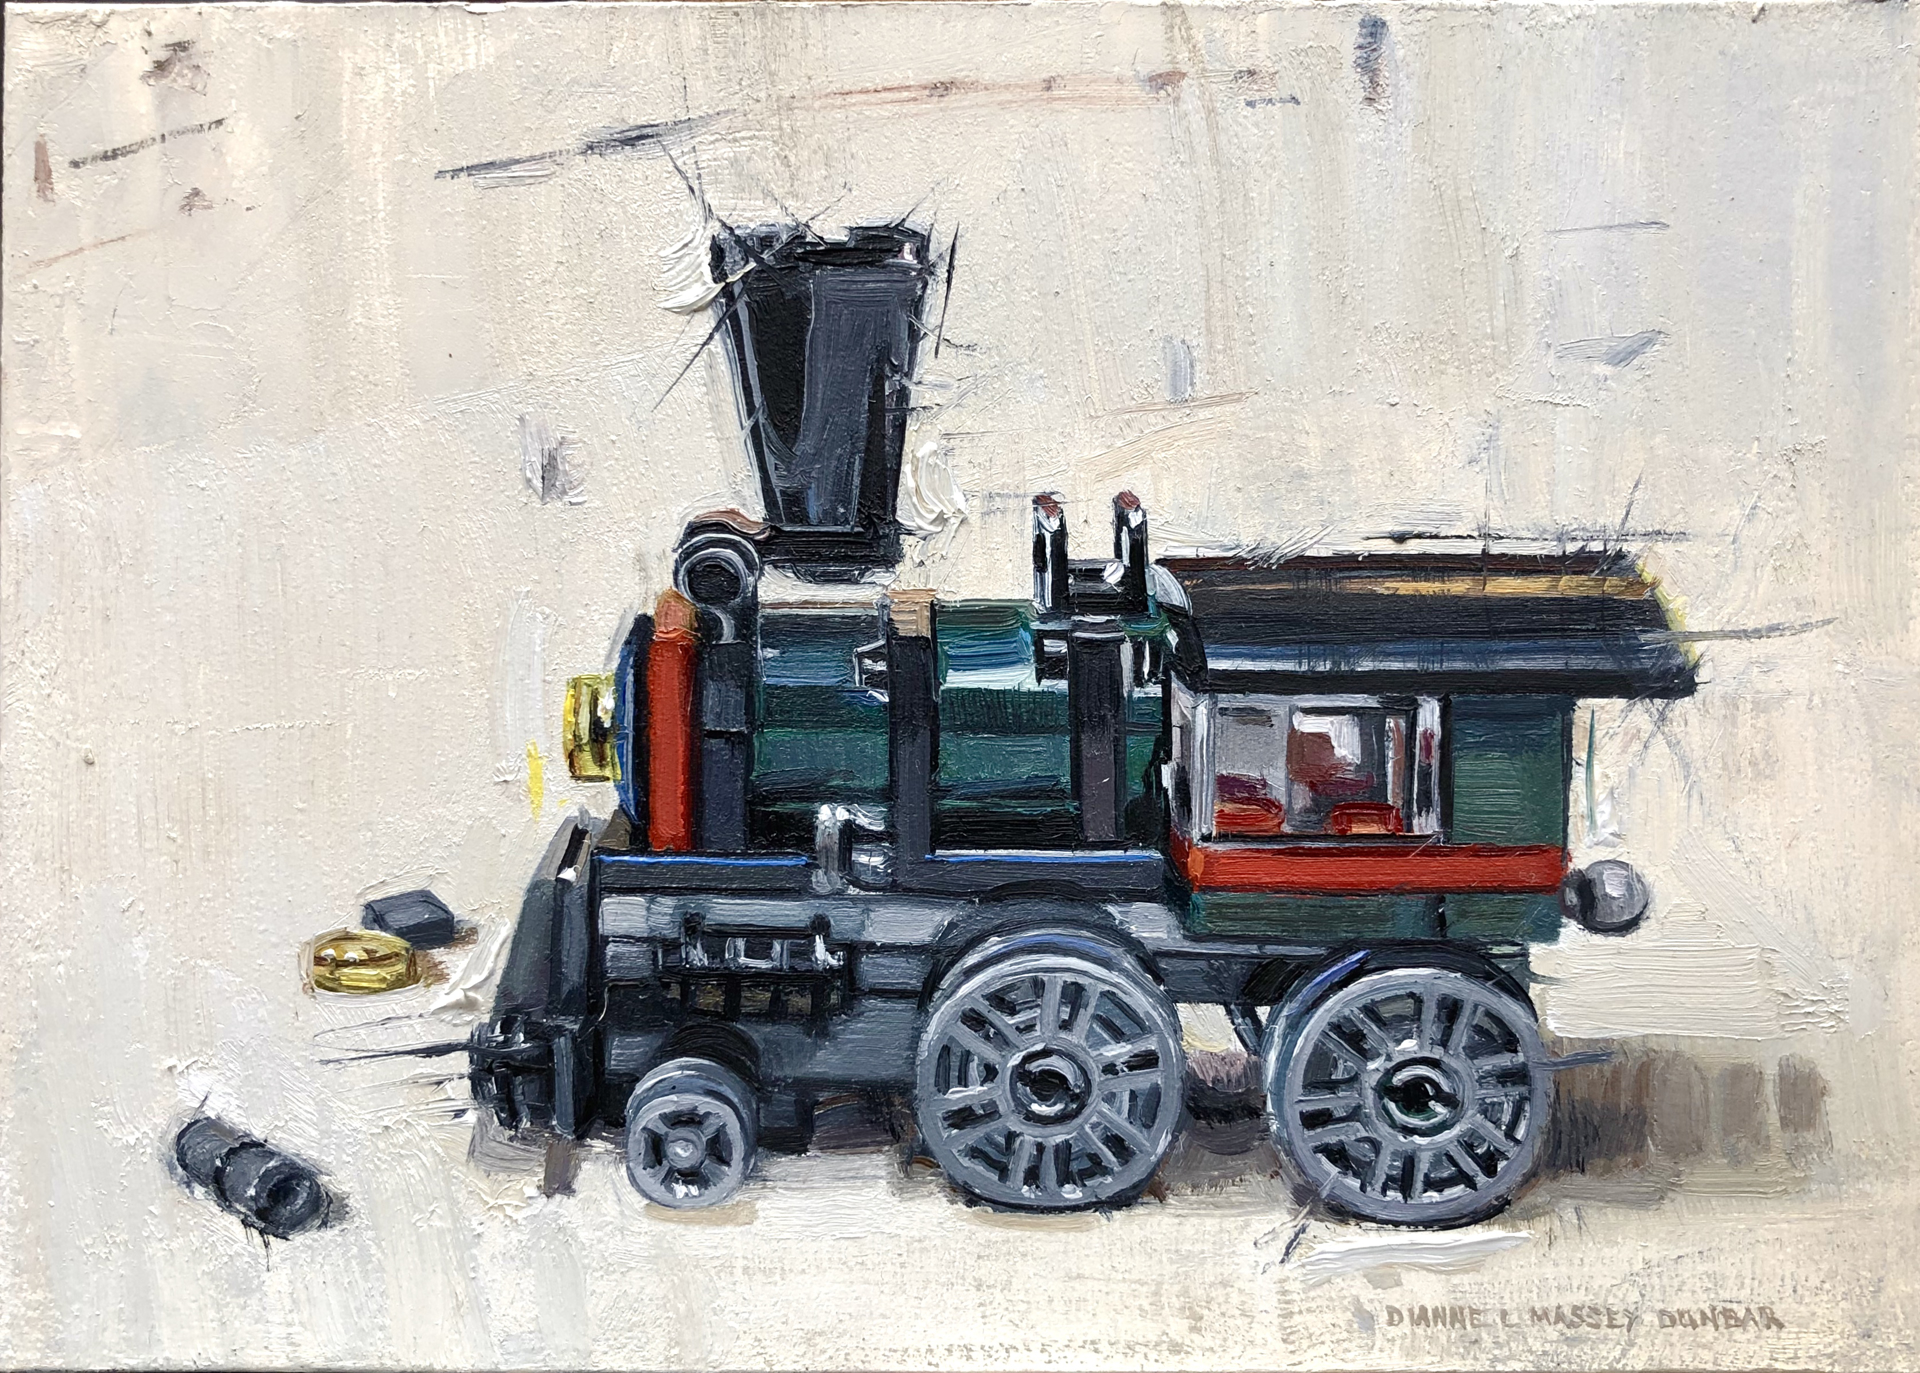 Train Engine by Dianne L Massey Dunbar